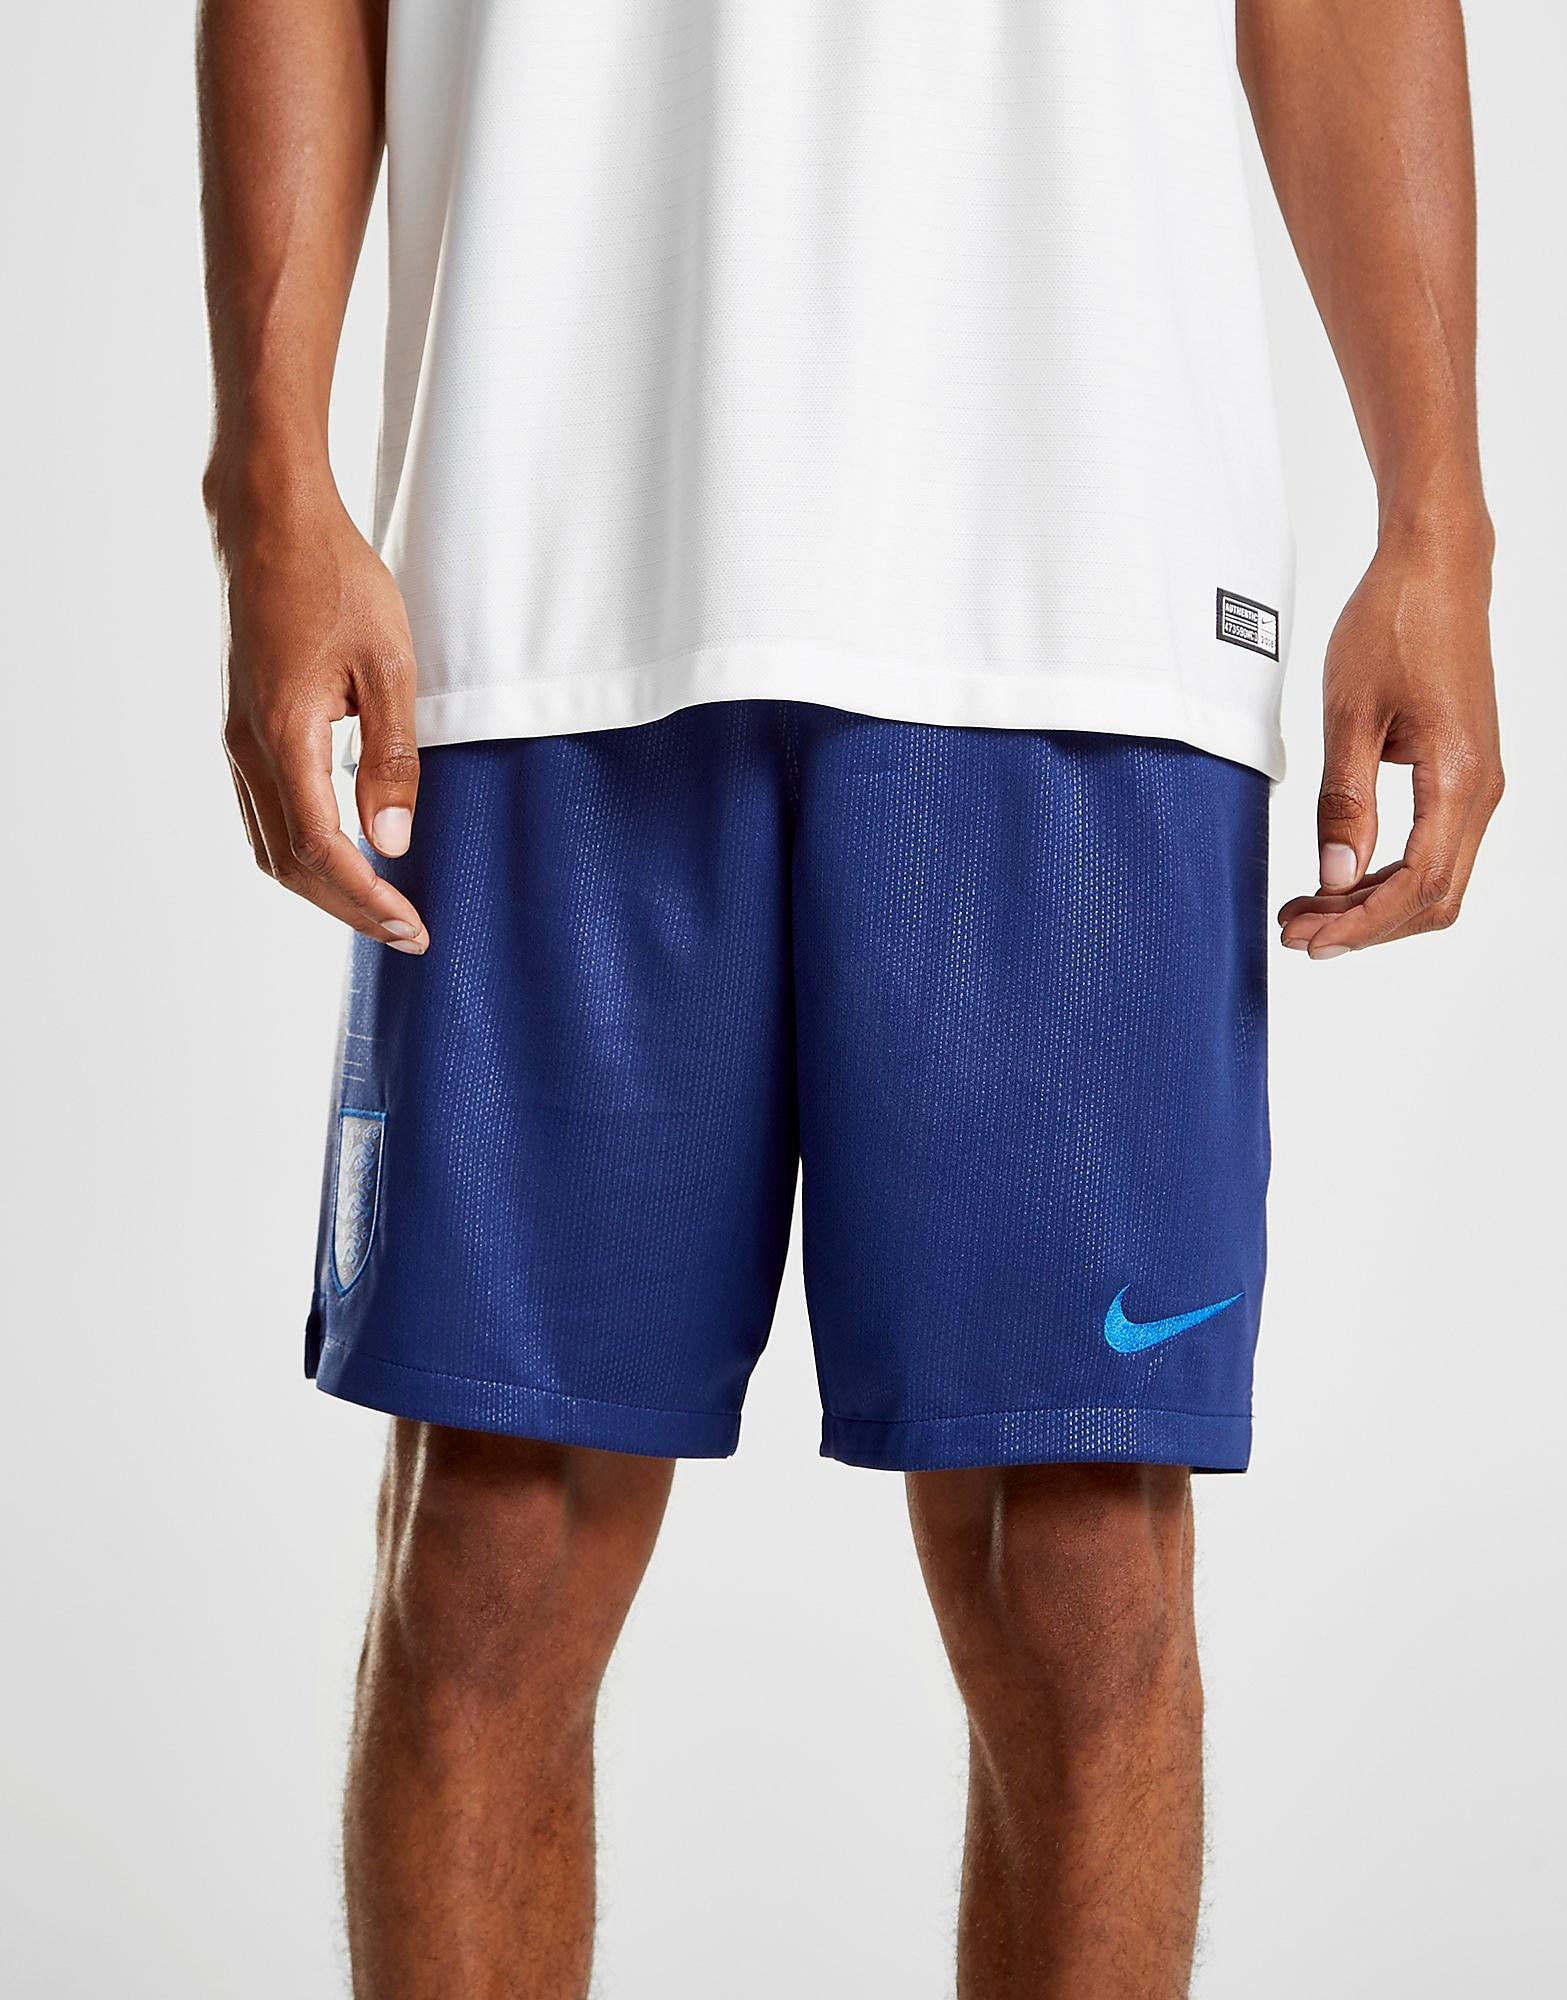 Nike Short Domicile Angleterre 2018